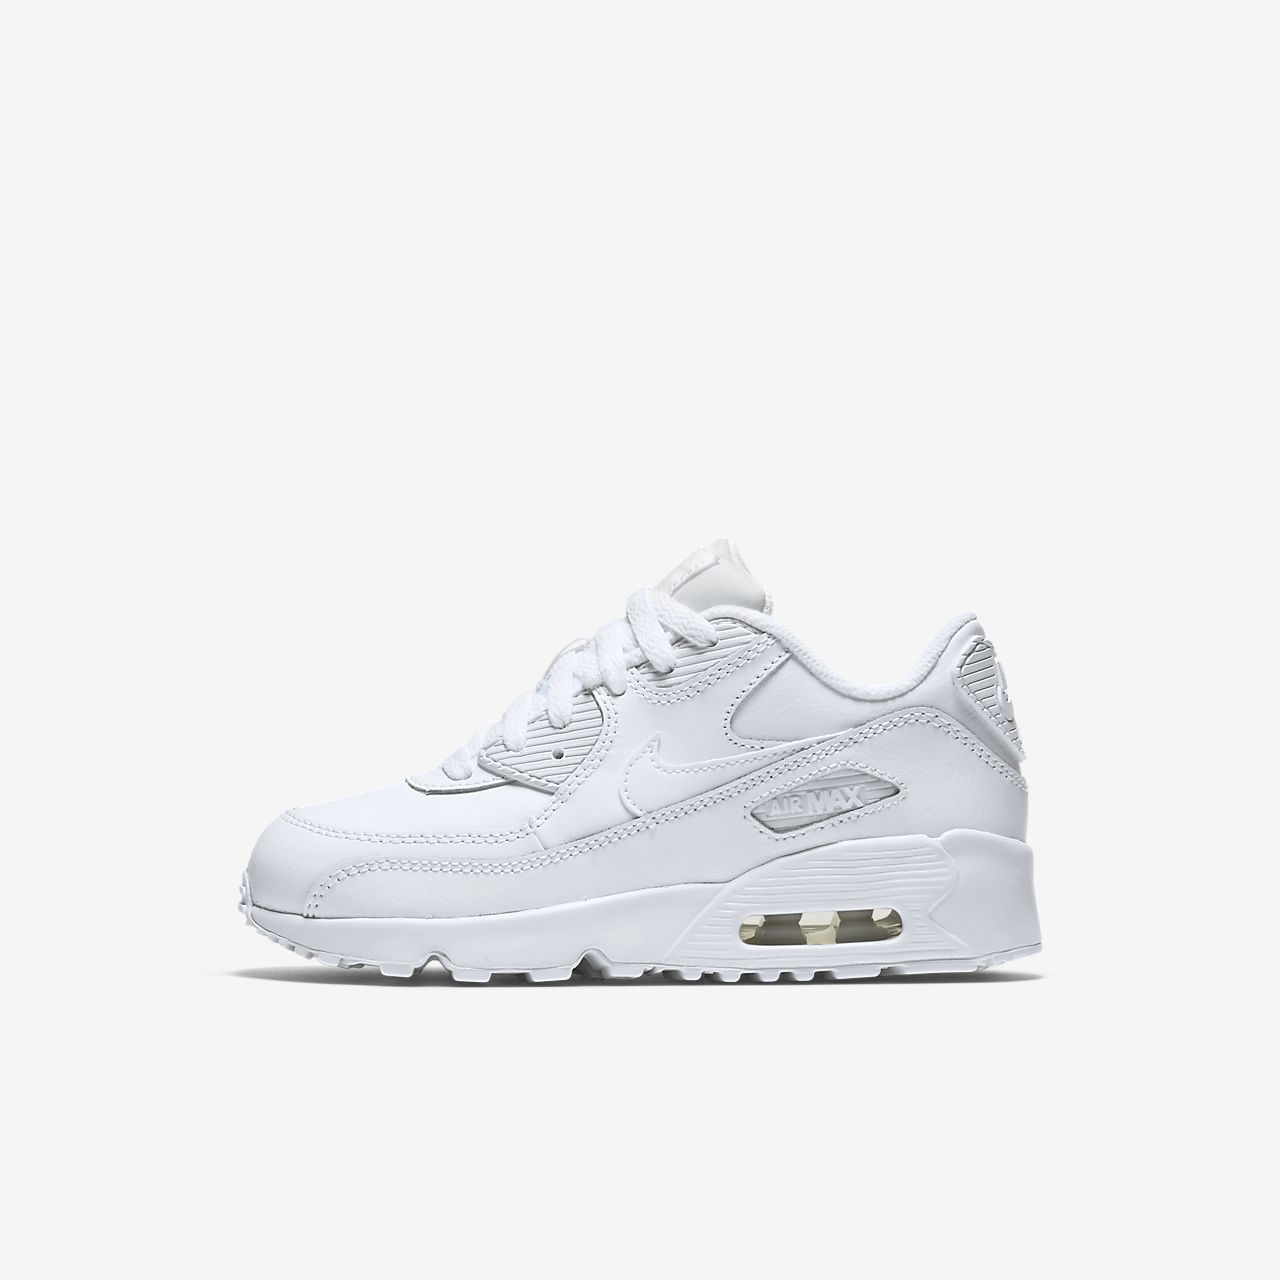 Nike Air Force 1 Mid Schuh für jüngere Kinder (27,5–35